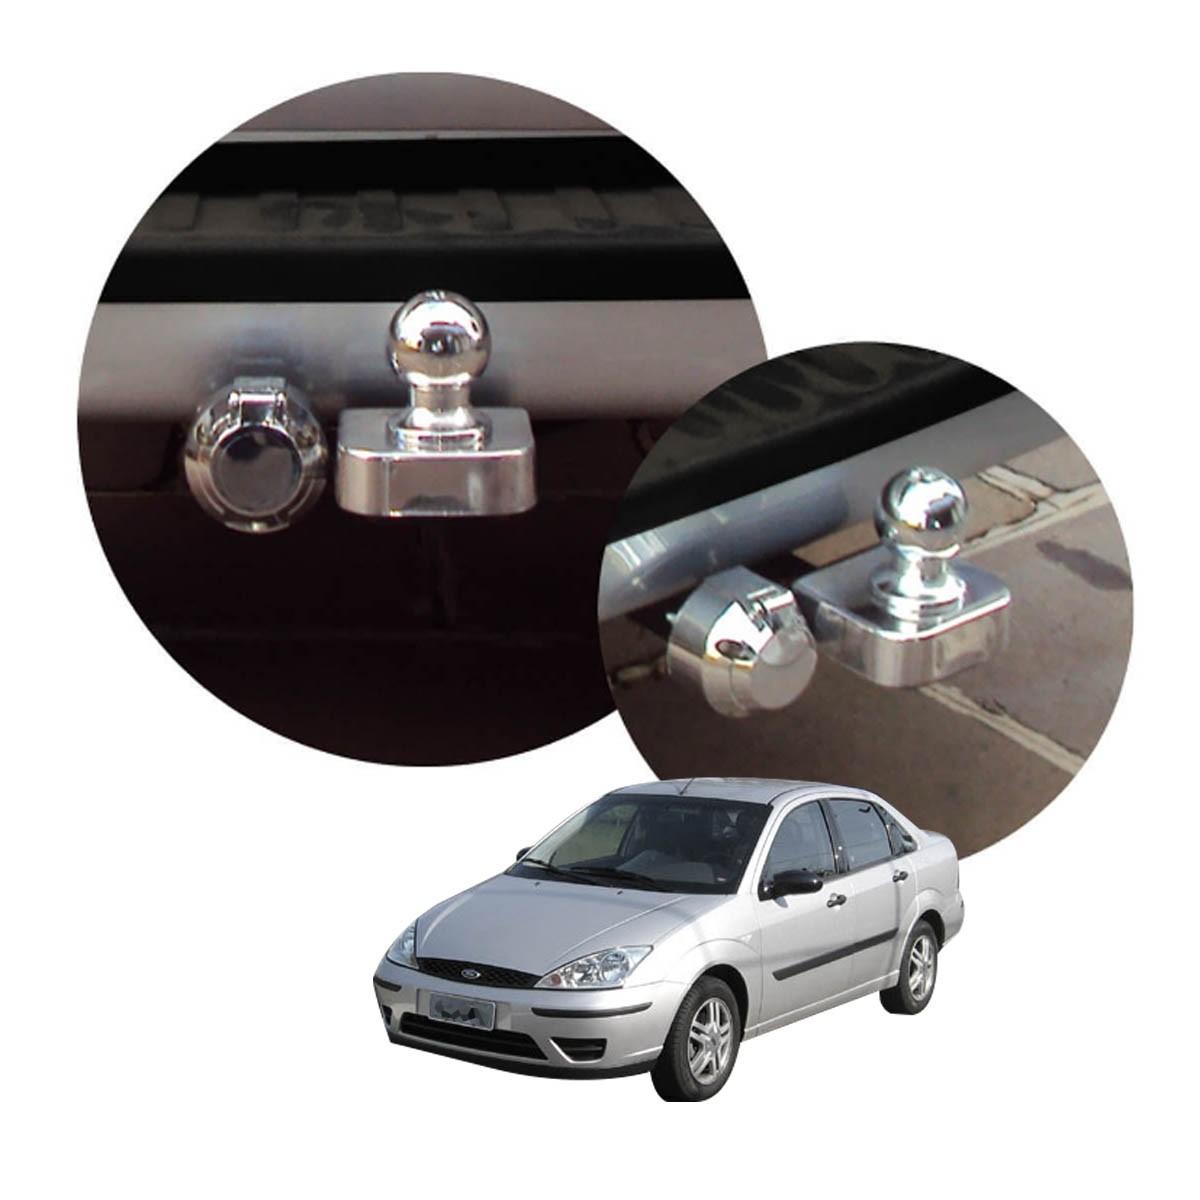 Engate de reboque fixo Focus sedan 2003 a 2008